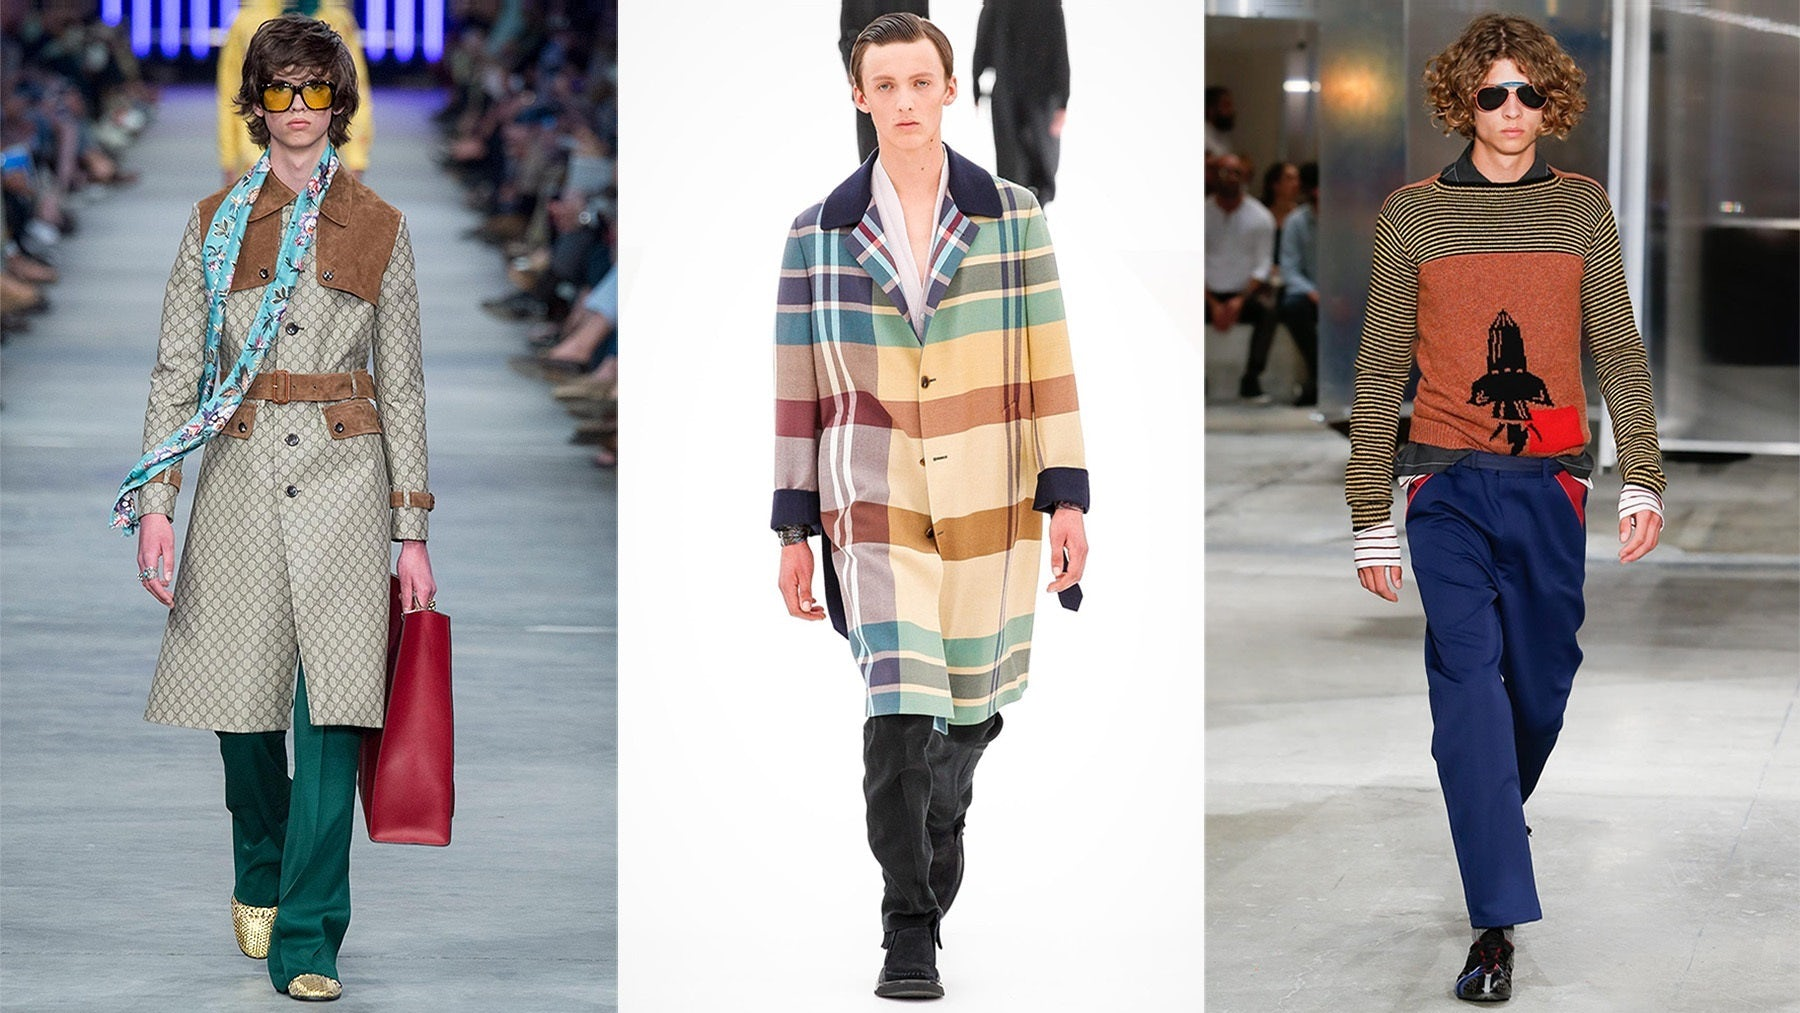 From left: Gucci, Ermenegildo Zegna, Prada Spring/Summer 2016   Source: Indigital